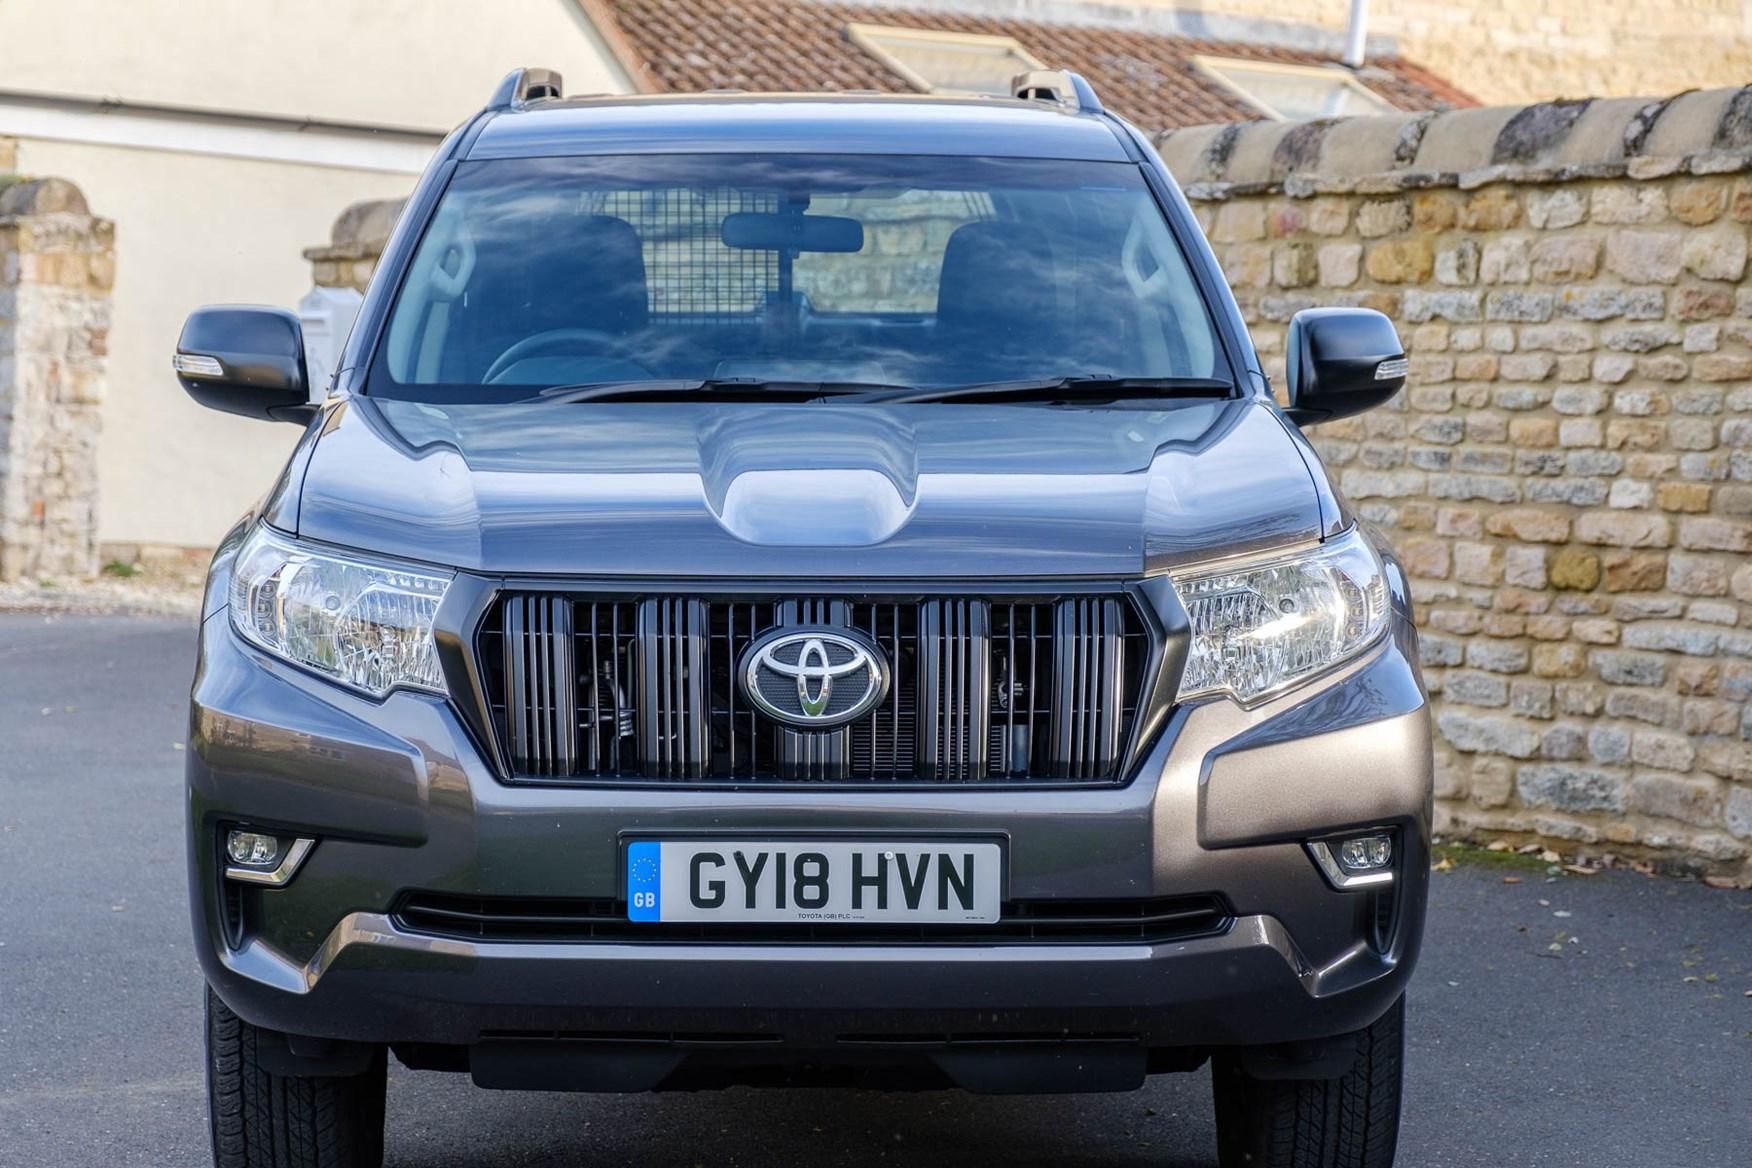 Toyota Land Cruiser Utility front